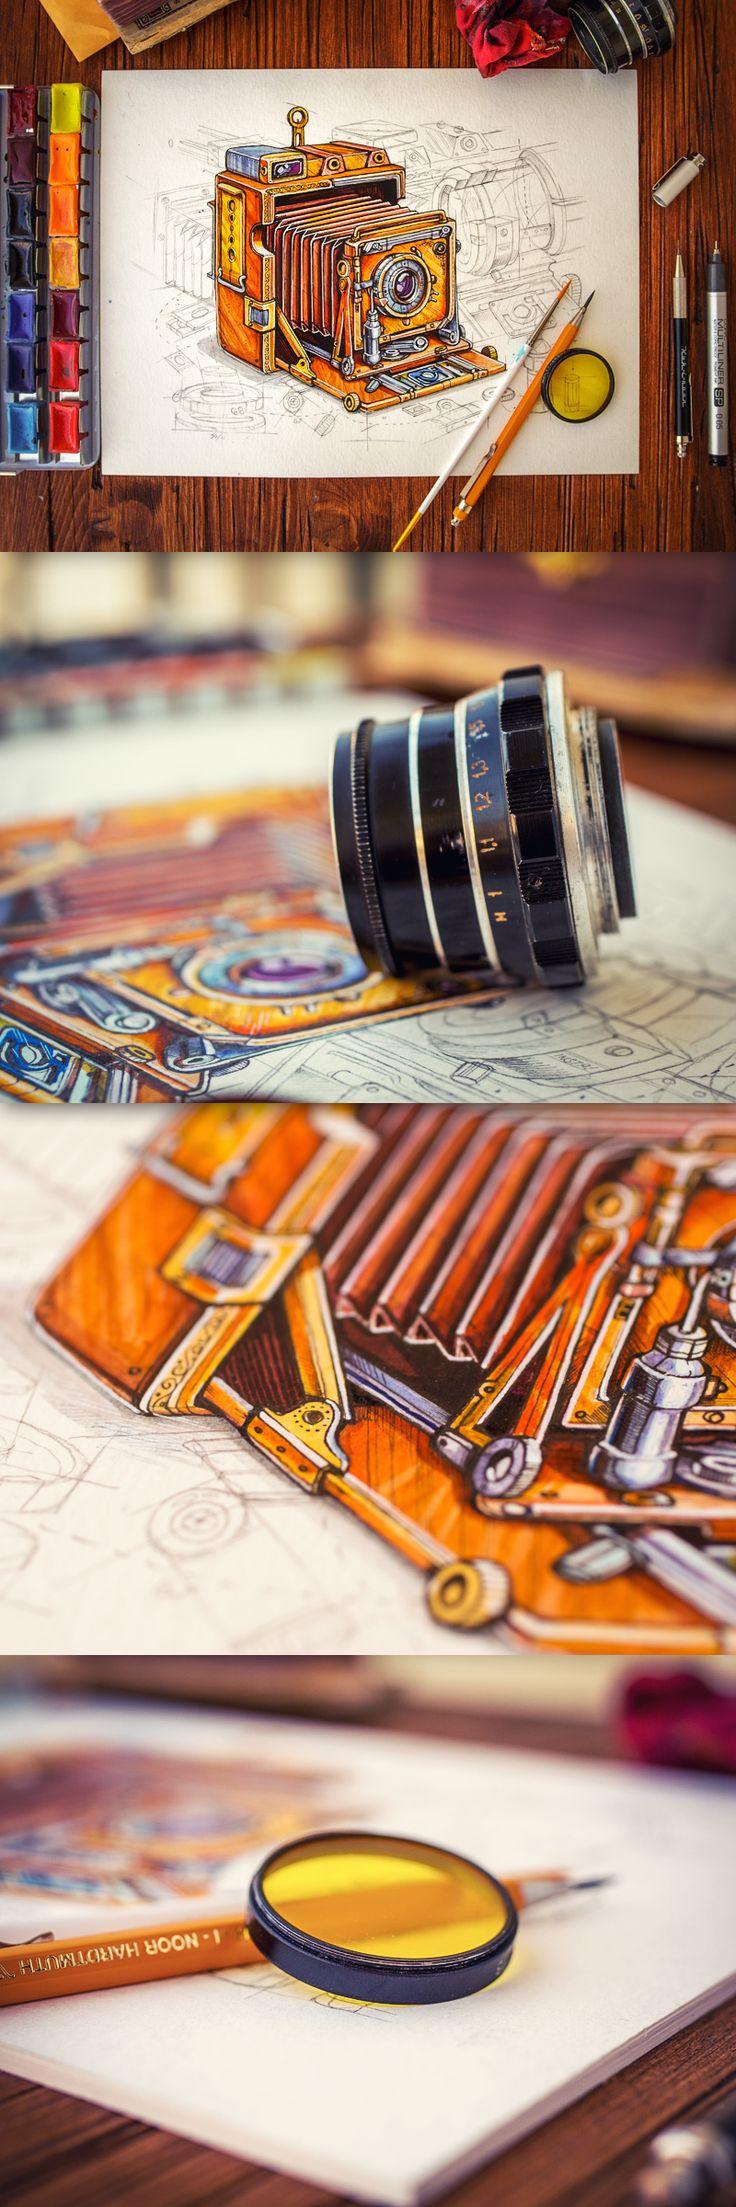 Steampunk Camera XXL - Amazing work by Mike - Creative Mints